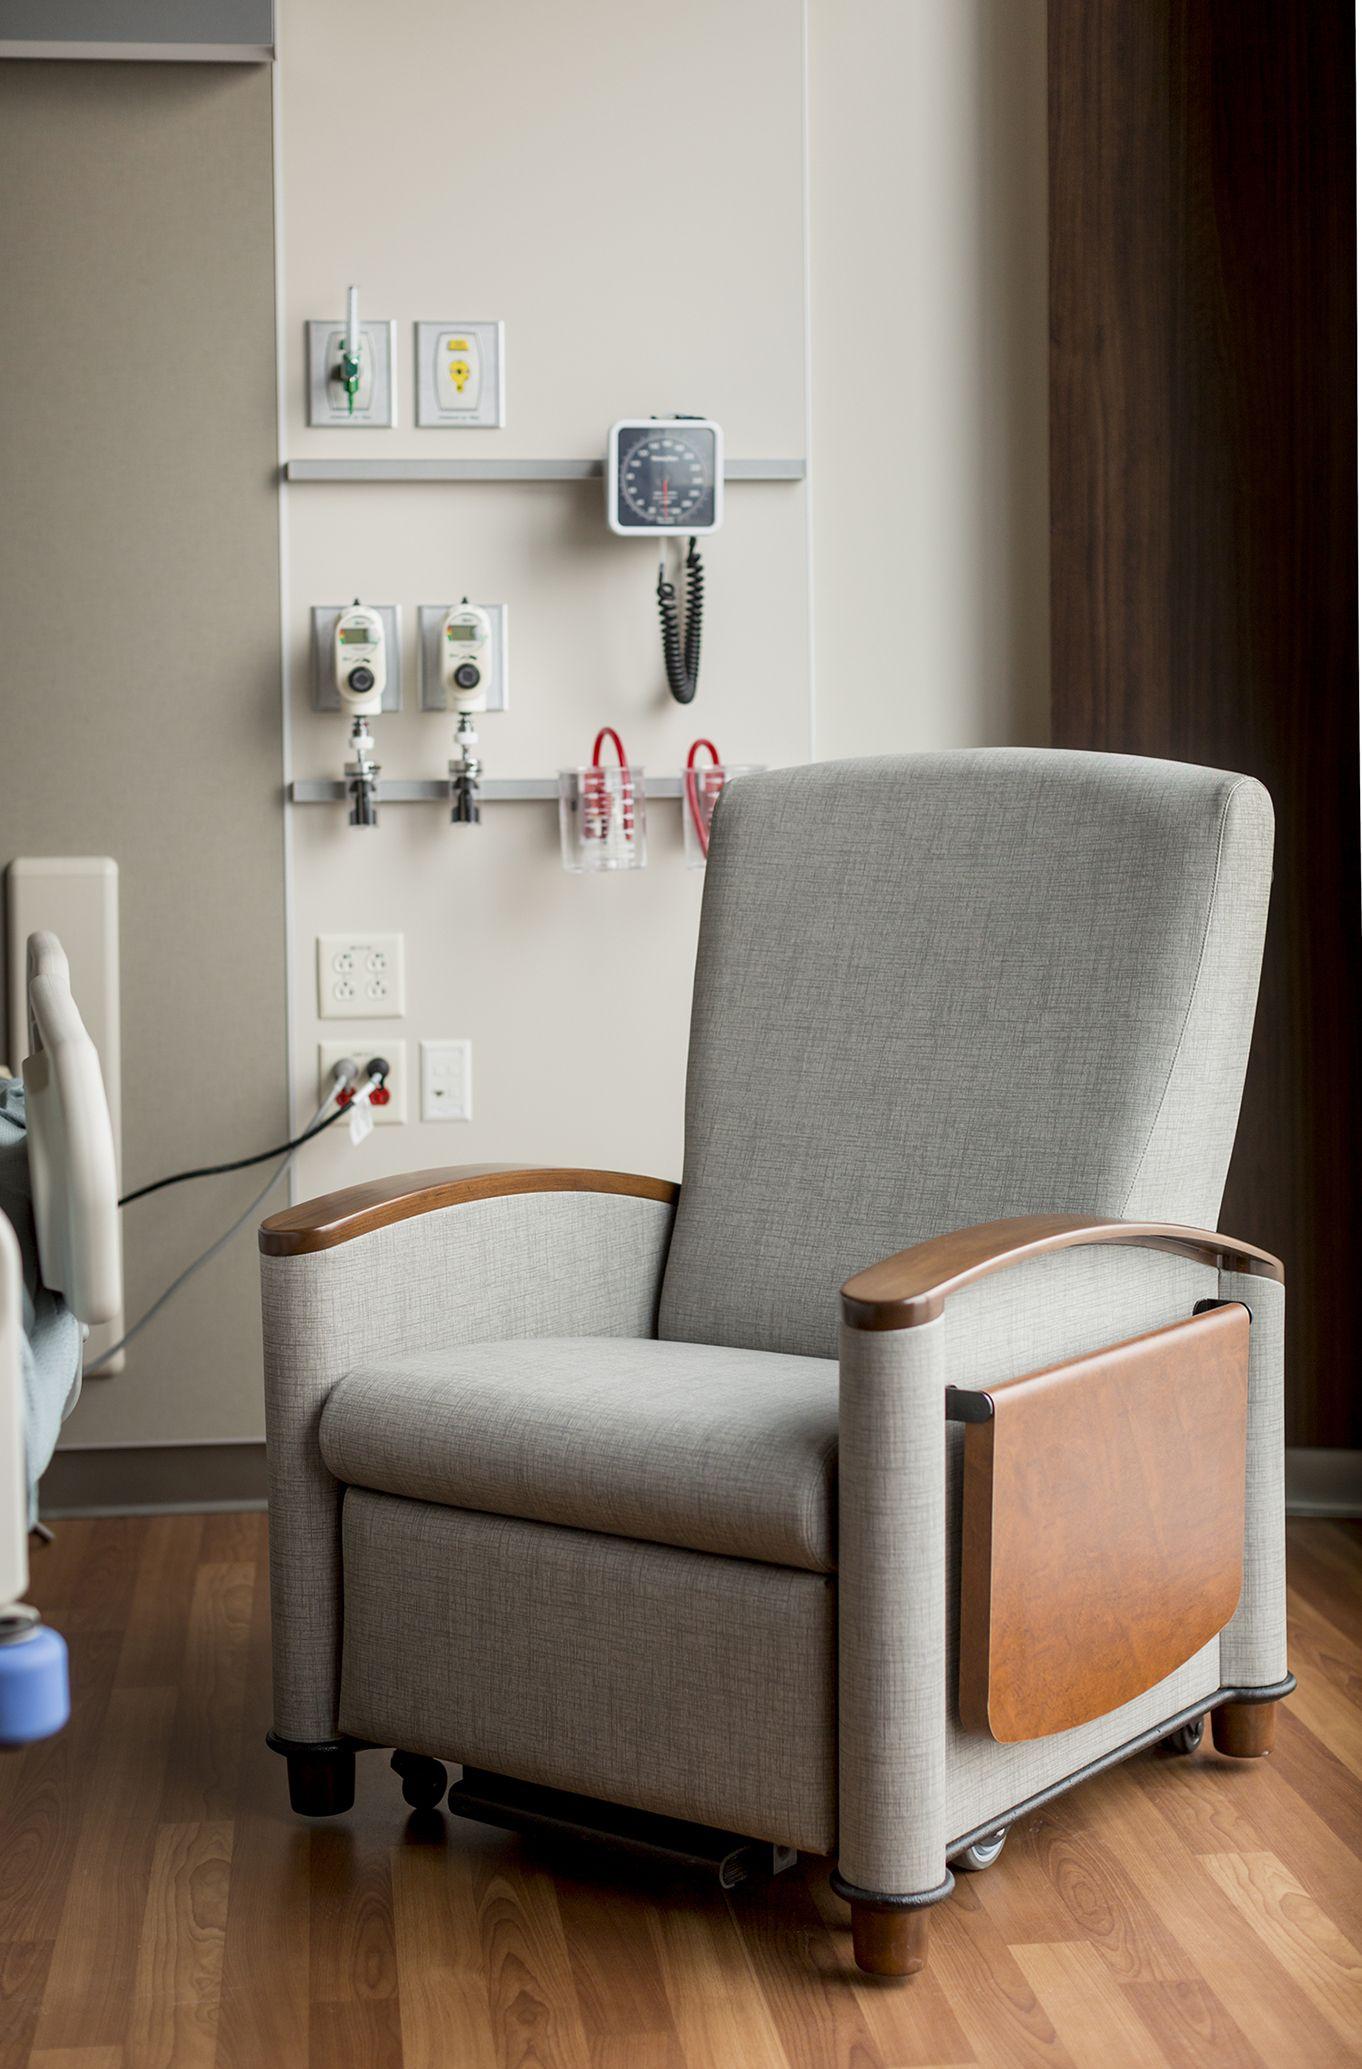 Patient Room Design: Healthcare Furniture, Furniture, Room